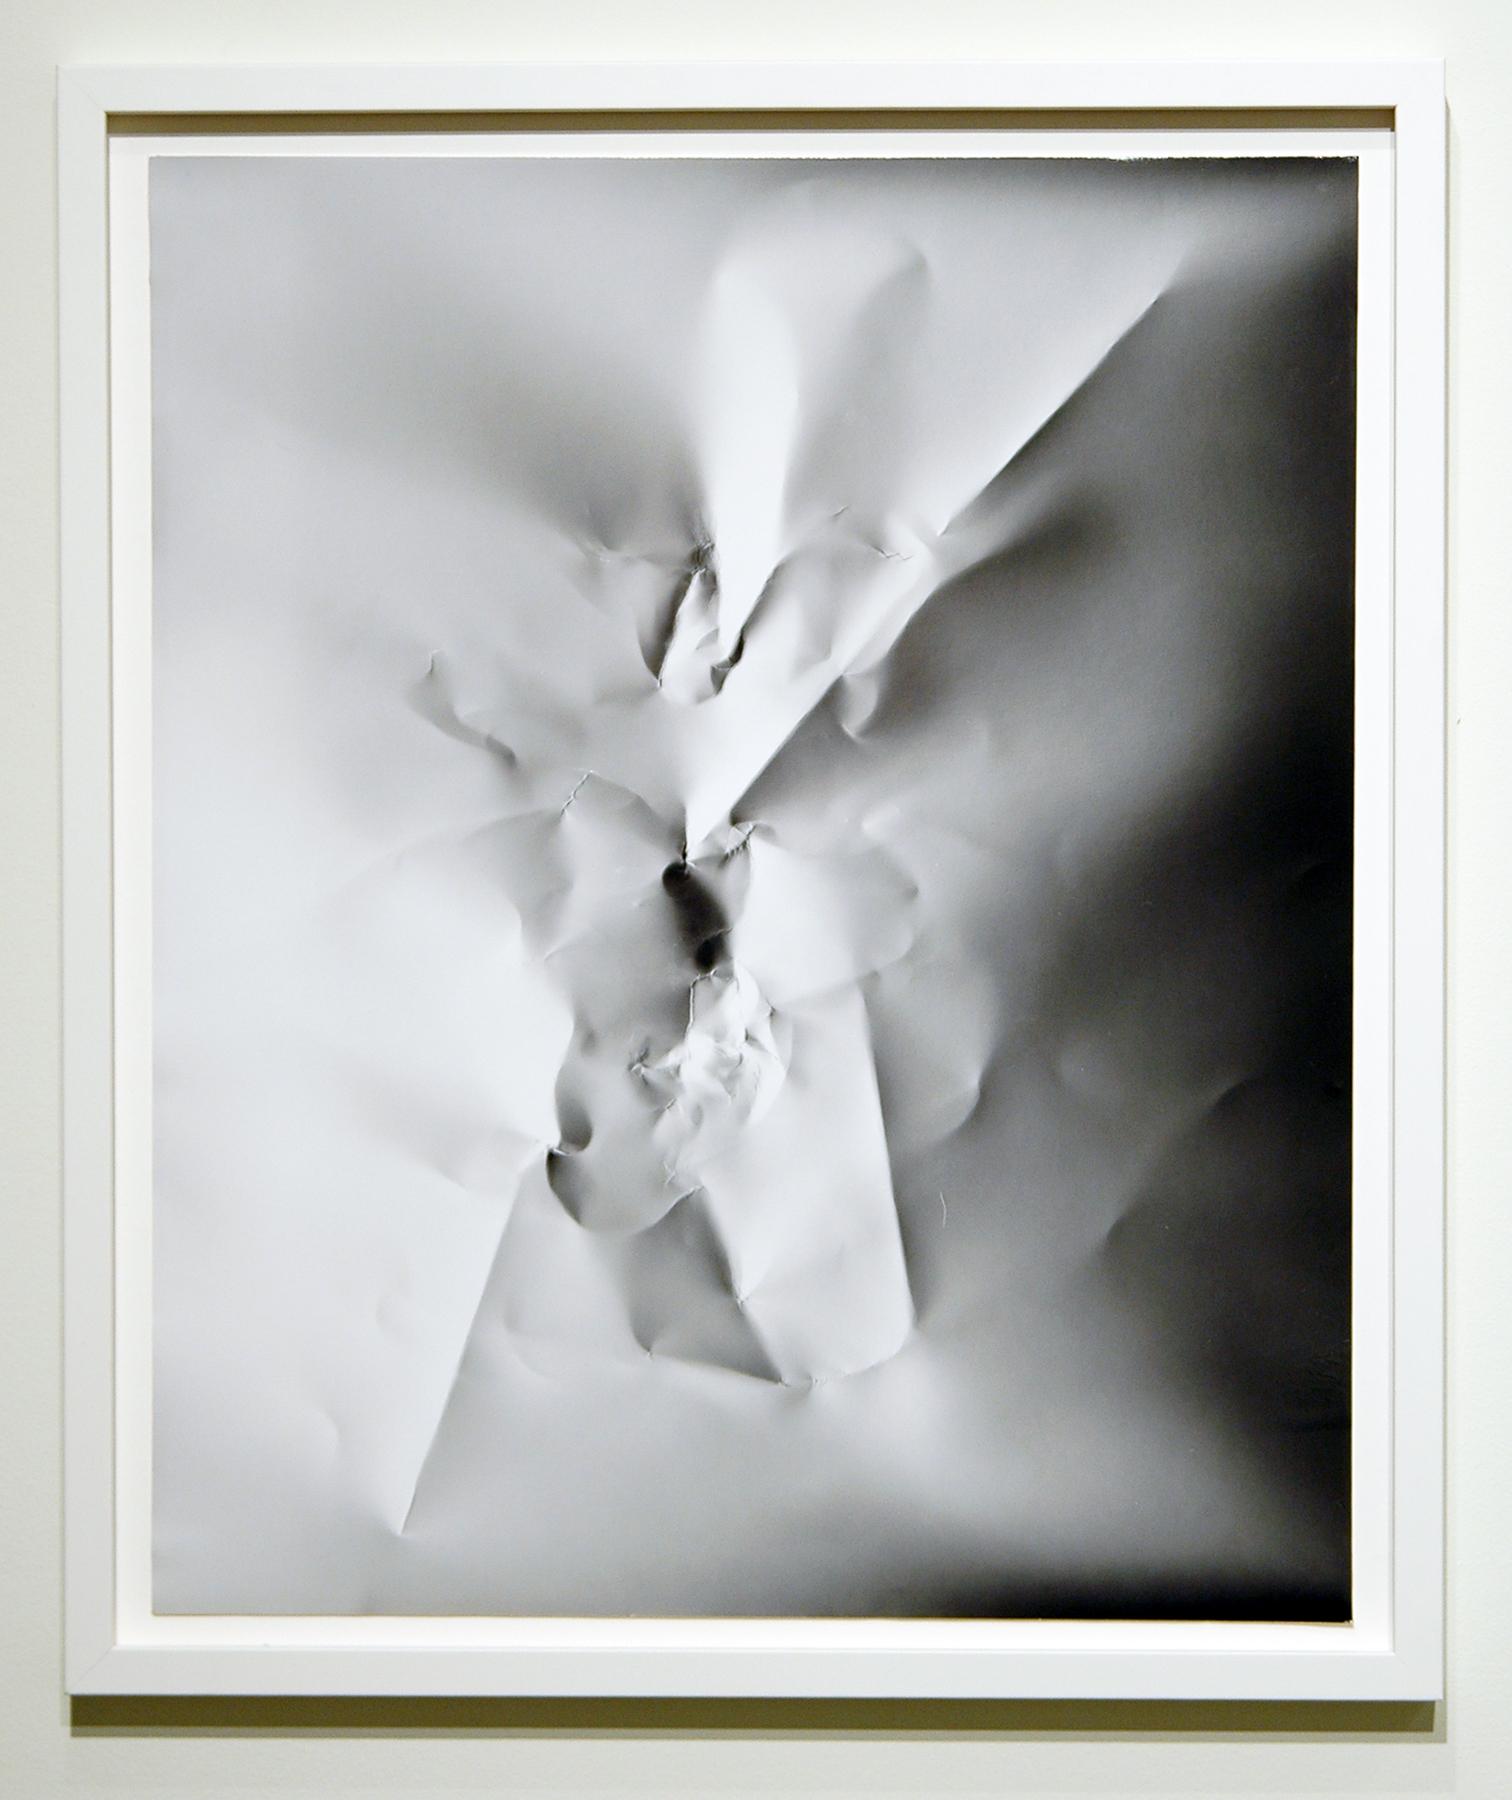 "WITH CINDER BLOCKS WE FLATTEN OUR PHOTOGRAPHS  C. Wright Daniel, Untitled (Portrait) , unique silver gelatin print, 26.5"" x 22"", 2013"